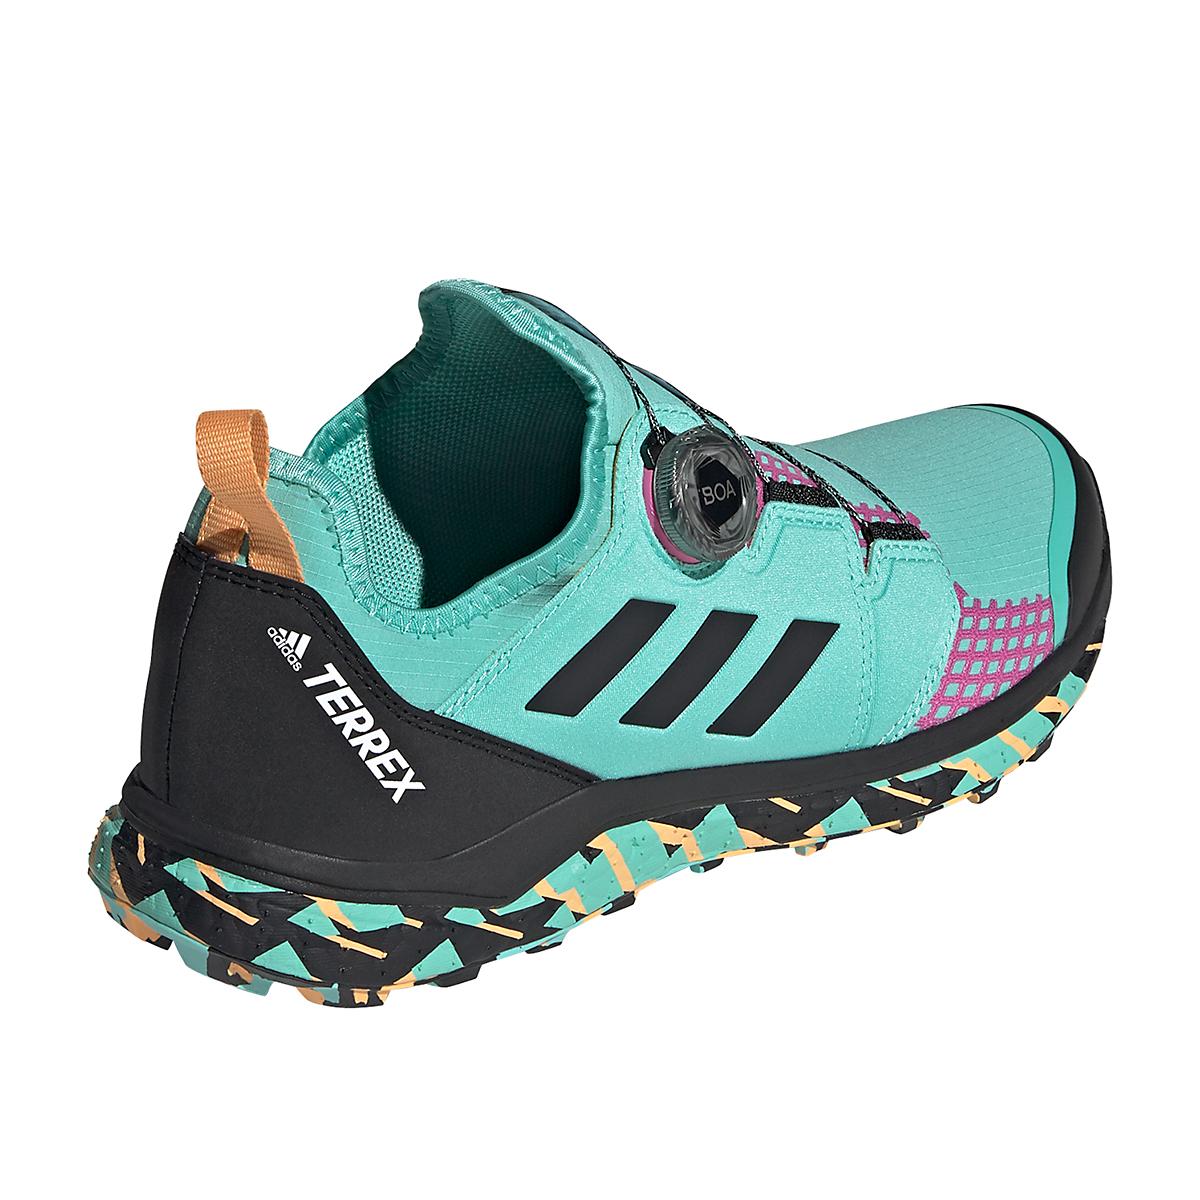 Men's Adidas Terrex Agravic BOA Trail Running Shoe - Color: Acid Mint/Core Black/Screaming Pink - Size: 6 - Width: Regular, Acid Mint/Core Black/Screaming Pink, large, image 5